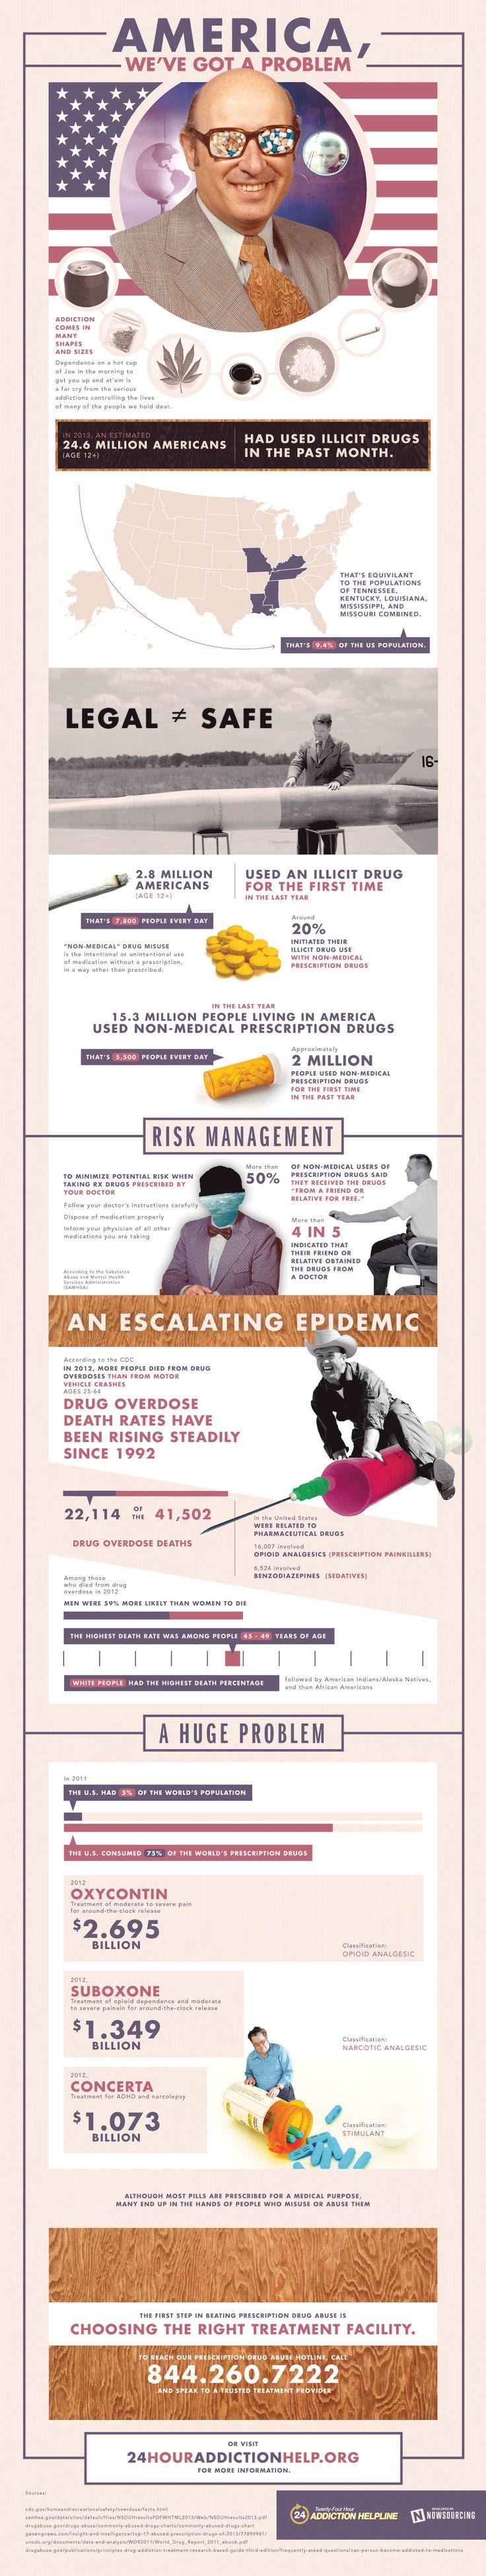 America, We've Got a Problem #infographic #Health #Drugs #America